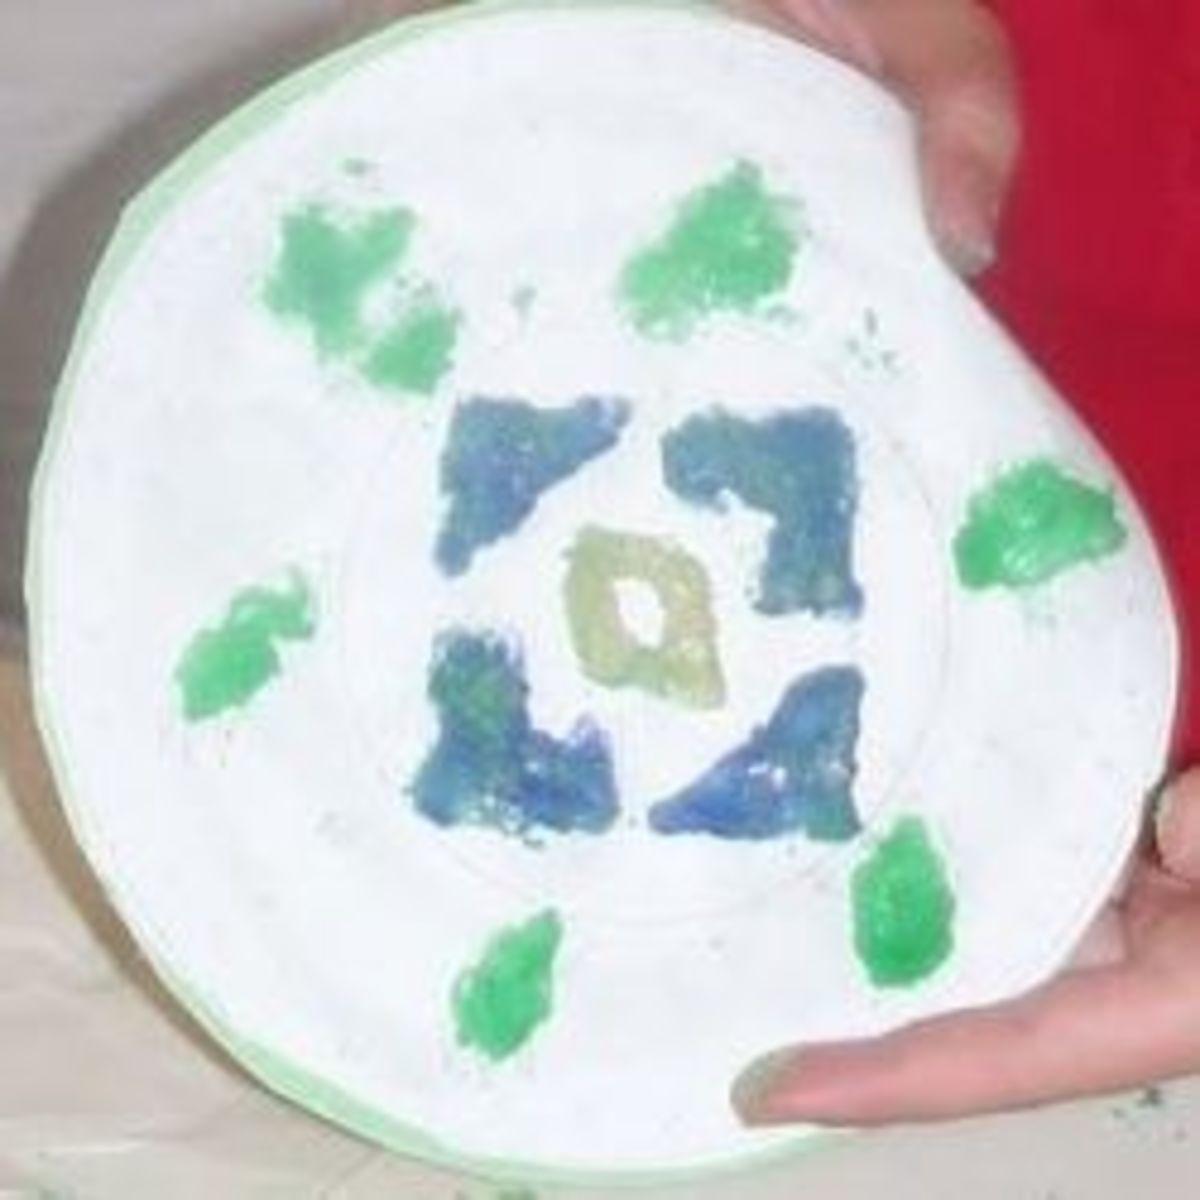 Navajo Sand Painting Craft Activity